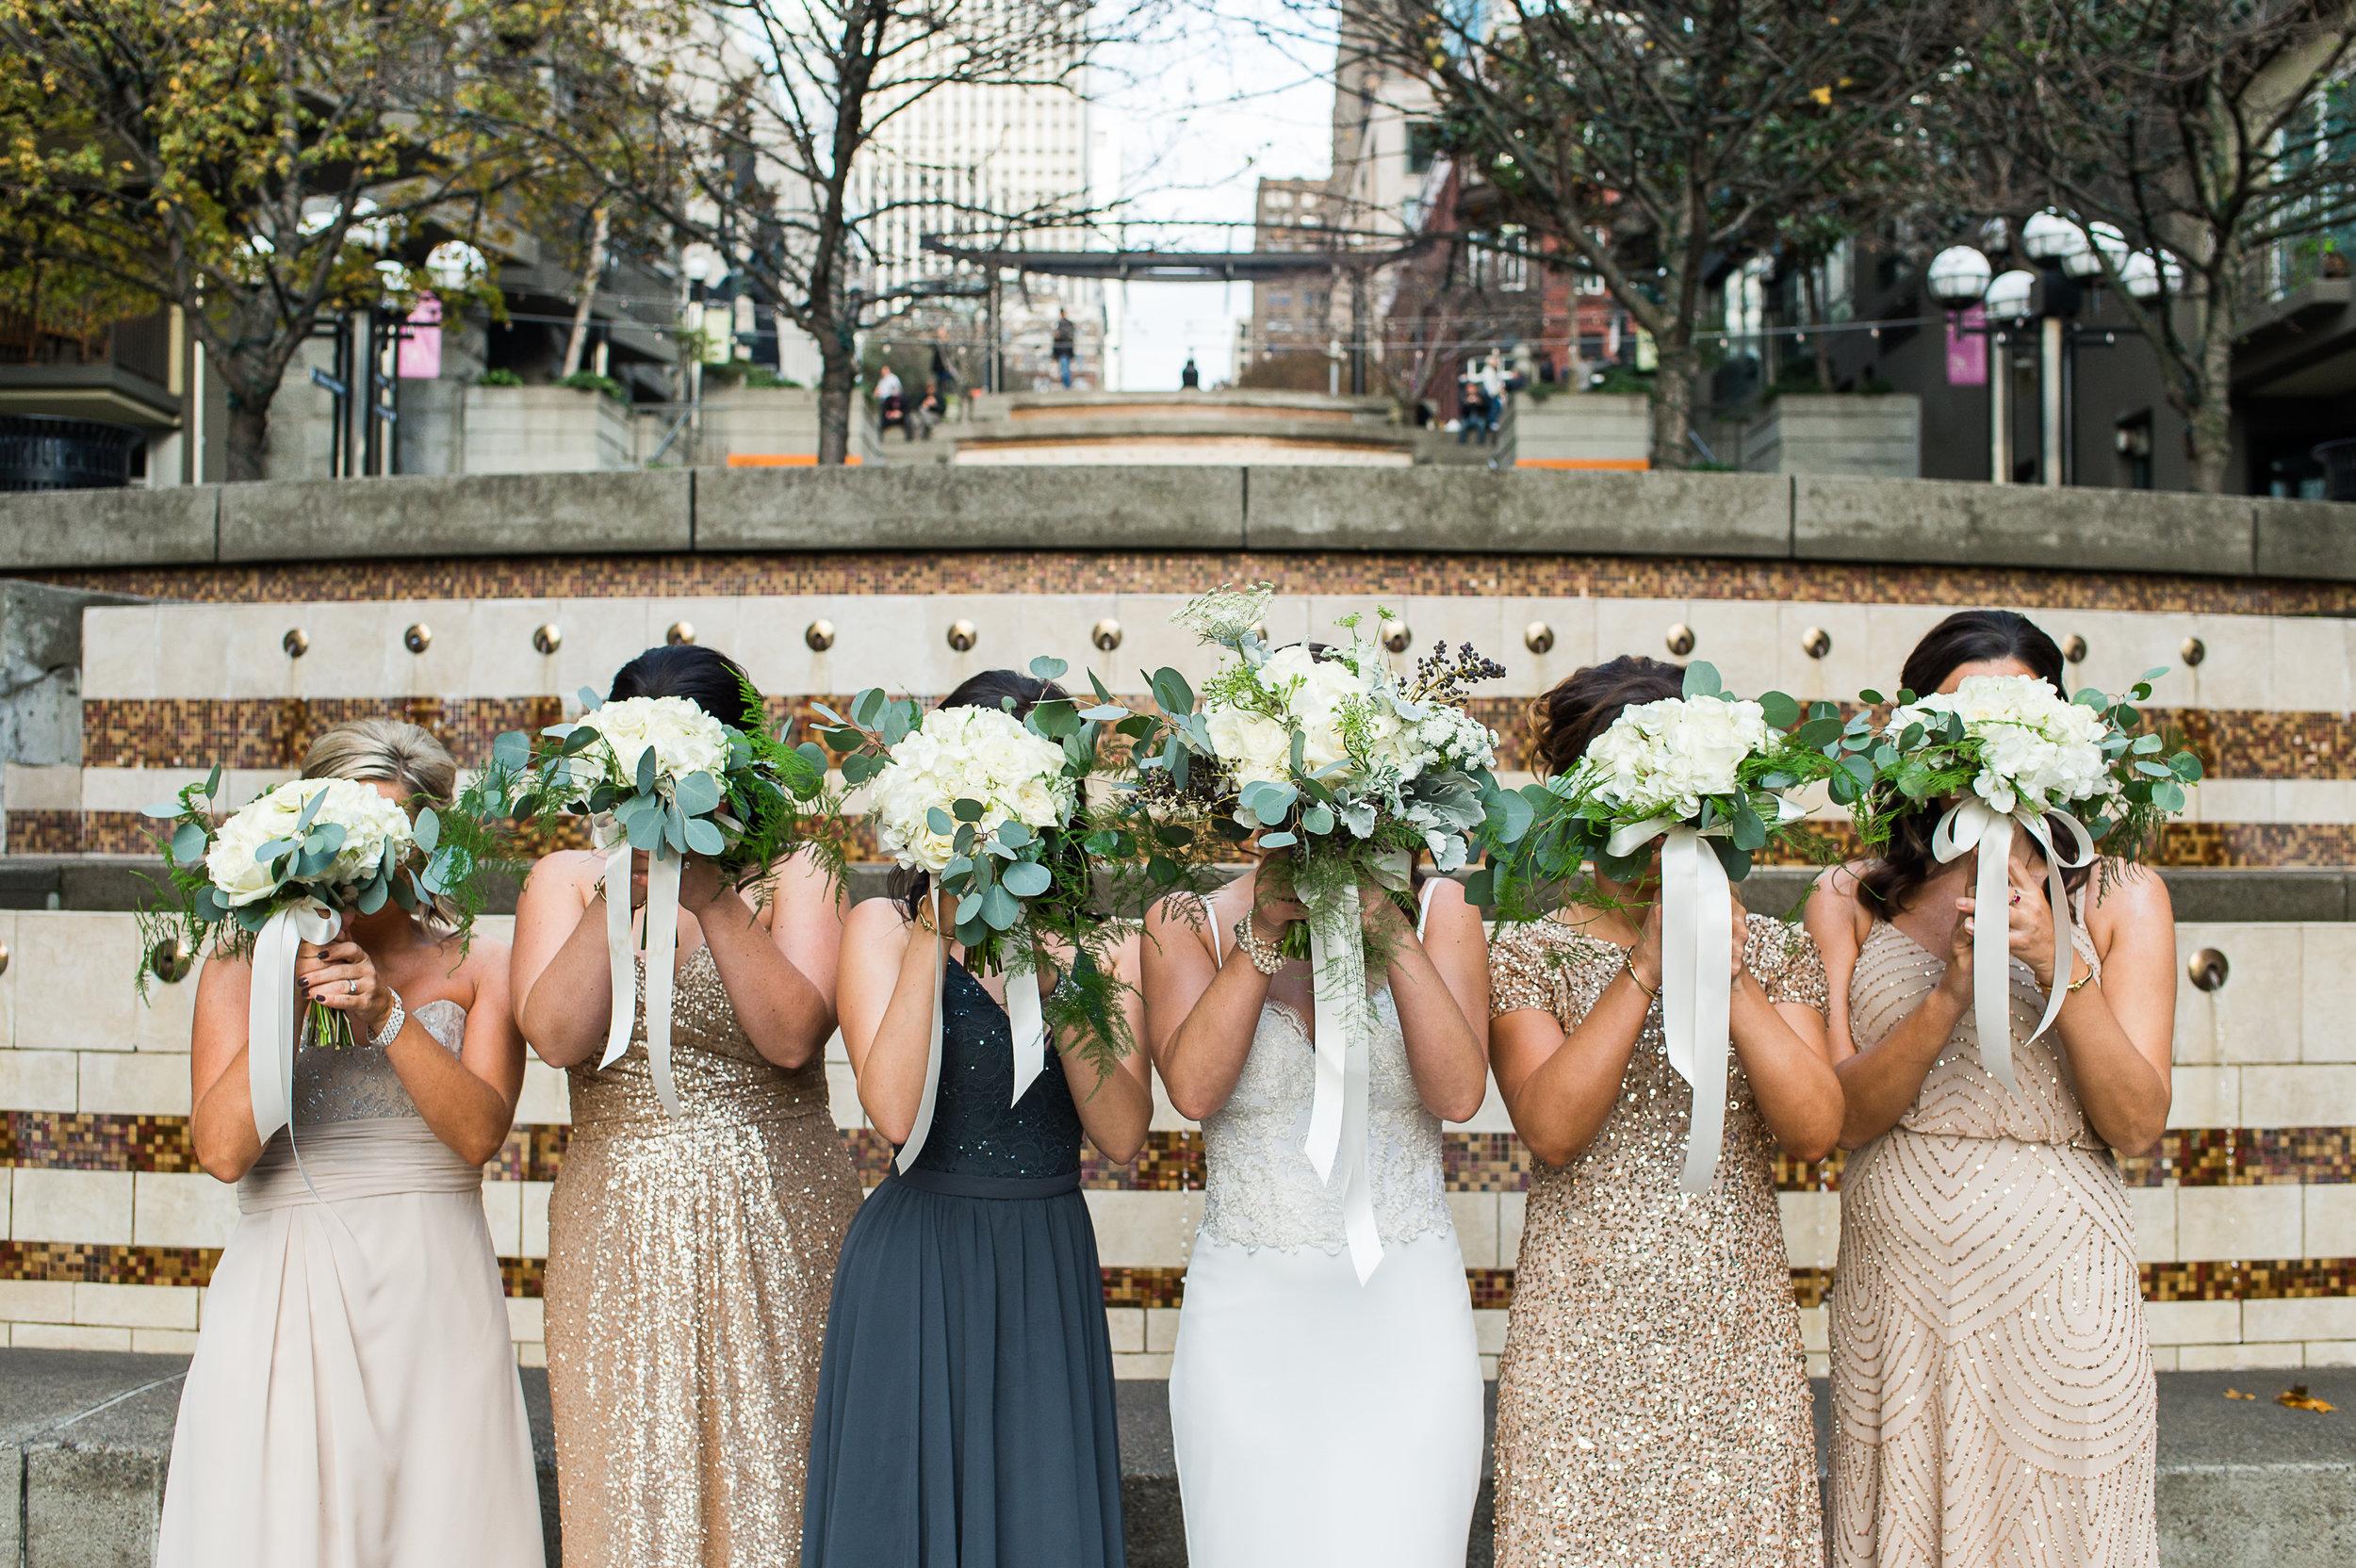 JJ-wedding-Van-Wyhe-Photography-195.jpg